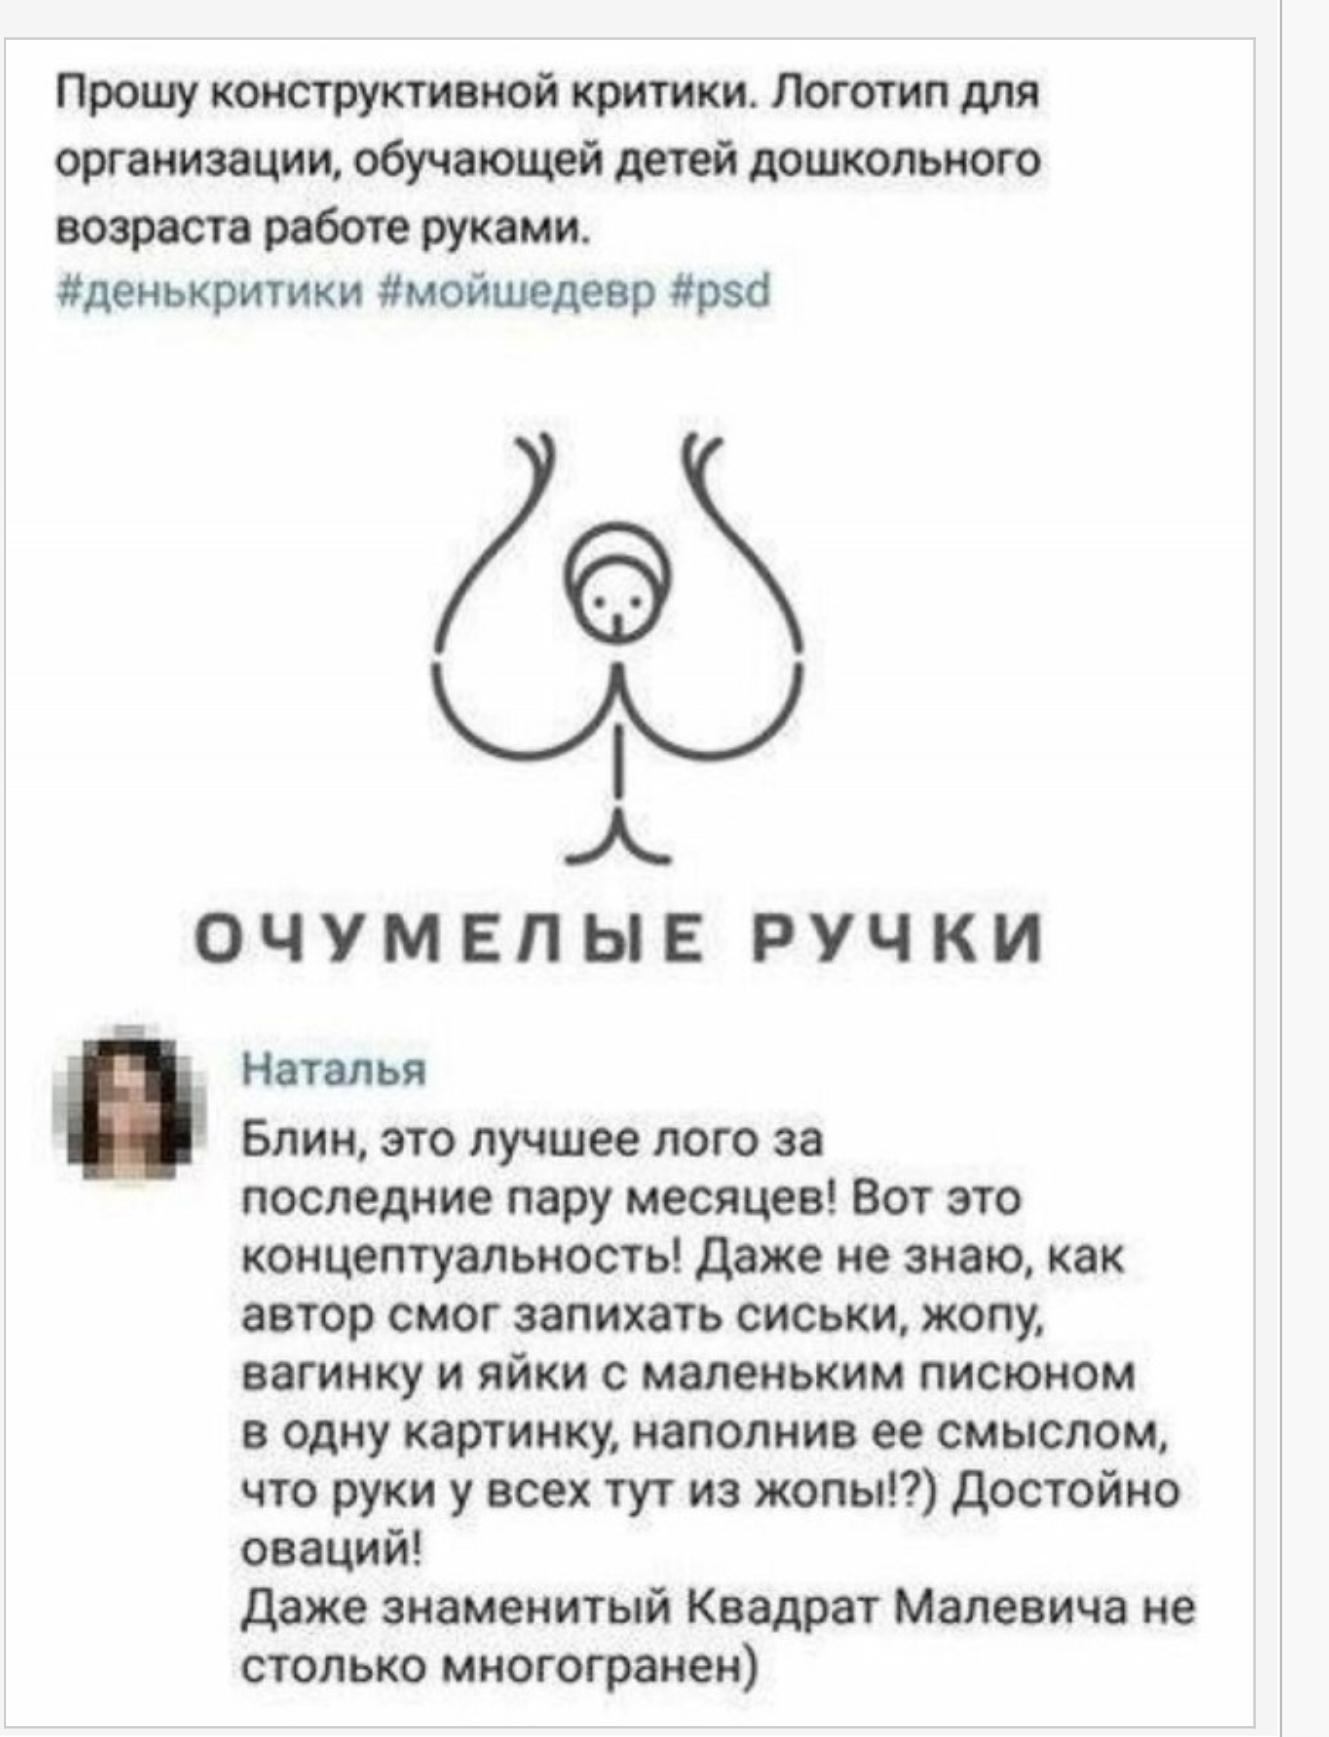 https://i2.imageban.ru/out/2020/02/21/e5fd64b46629544f0bdfd7439bb1176b.jpg